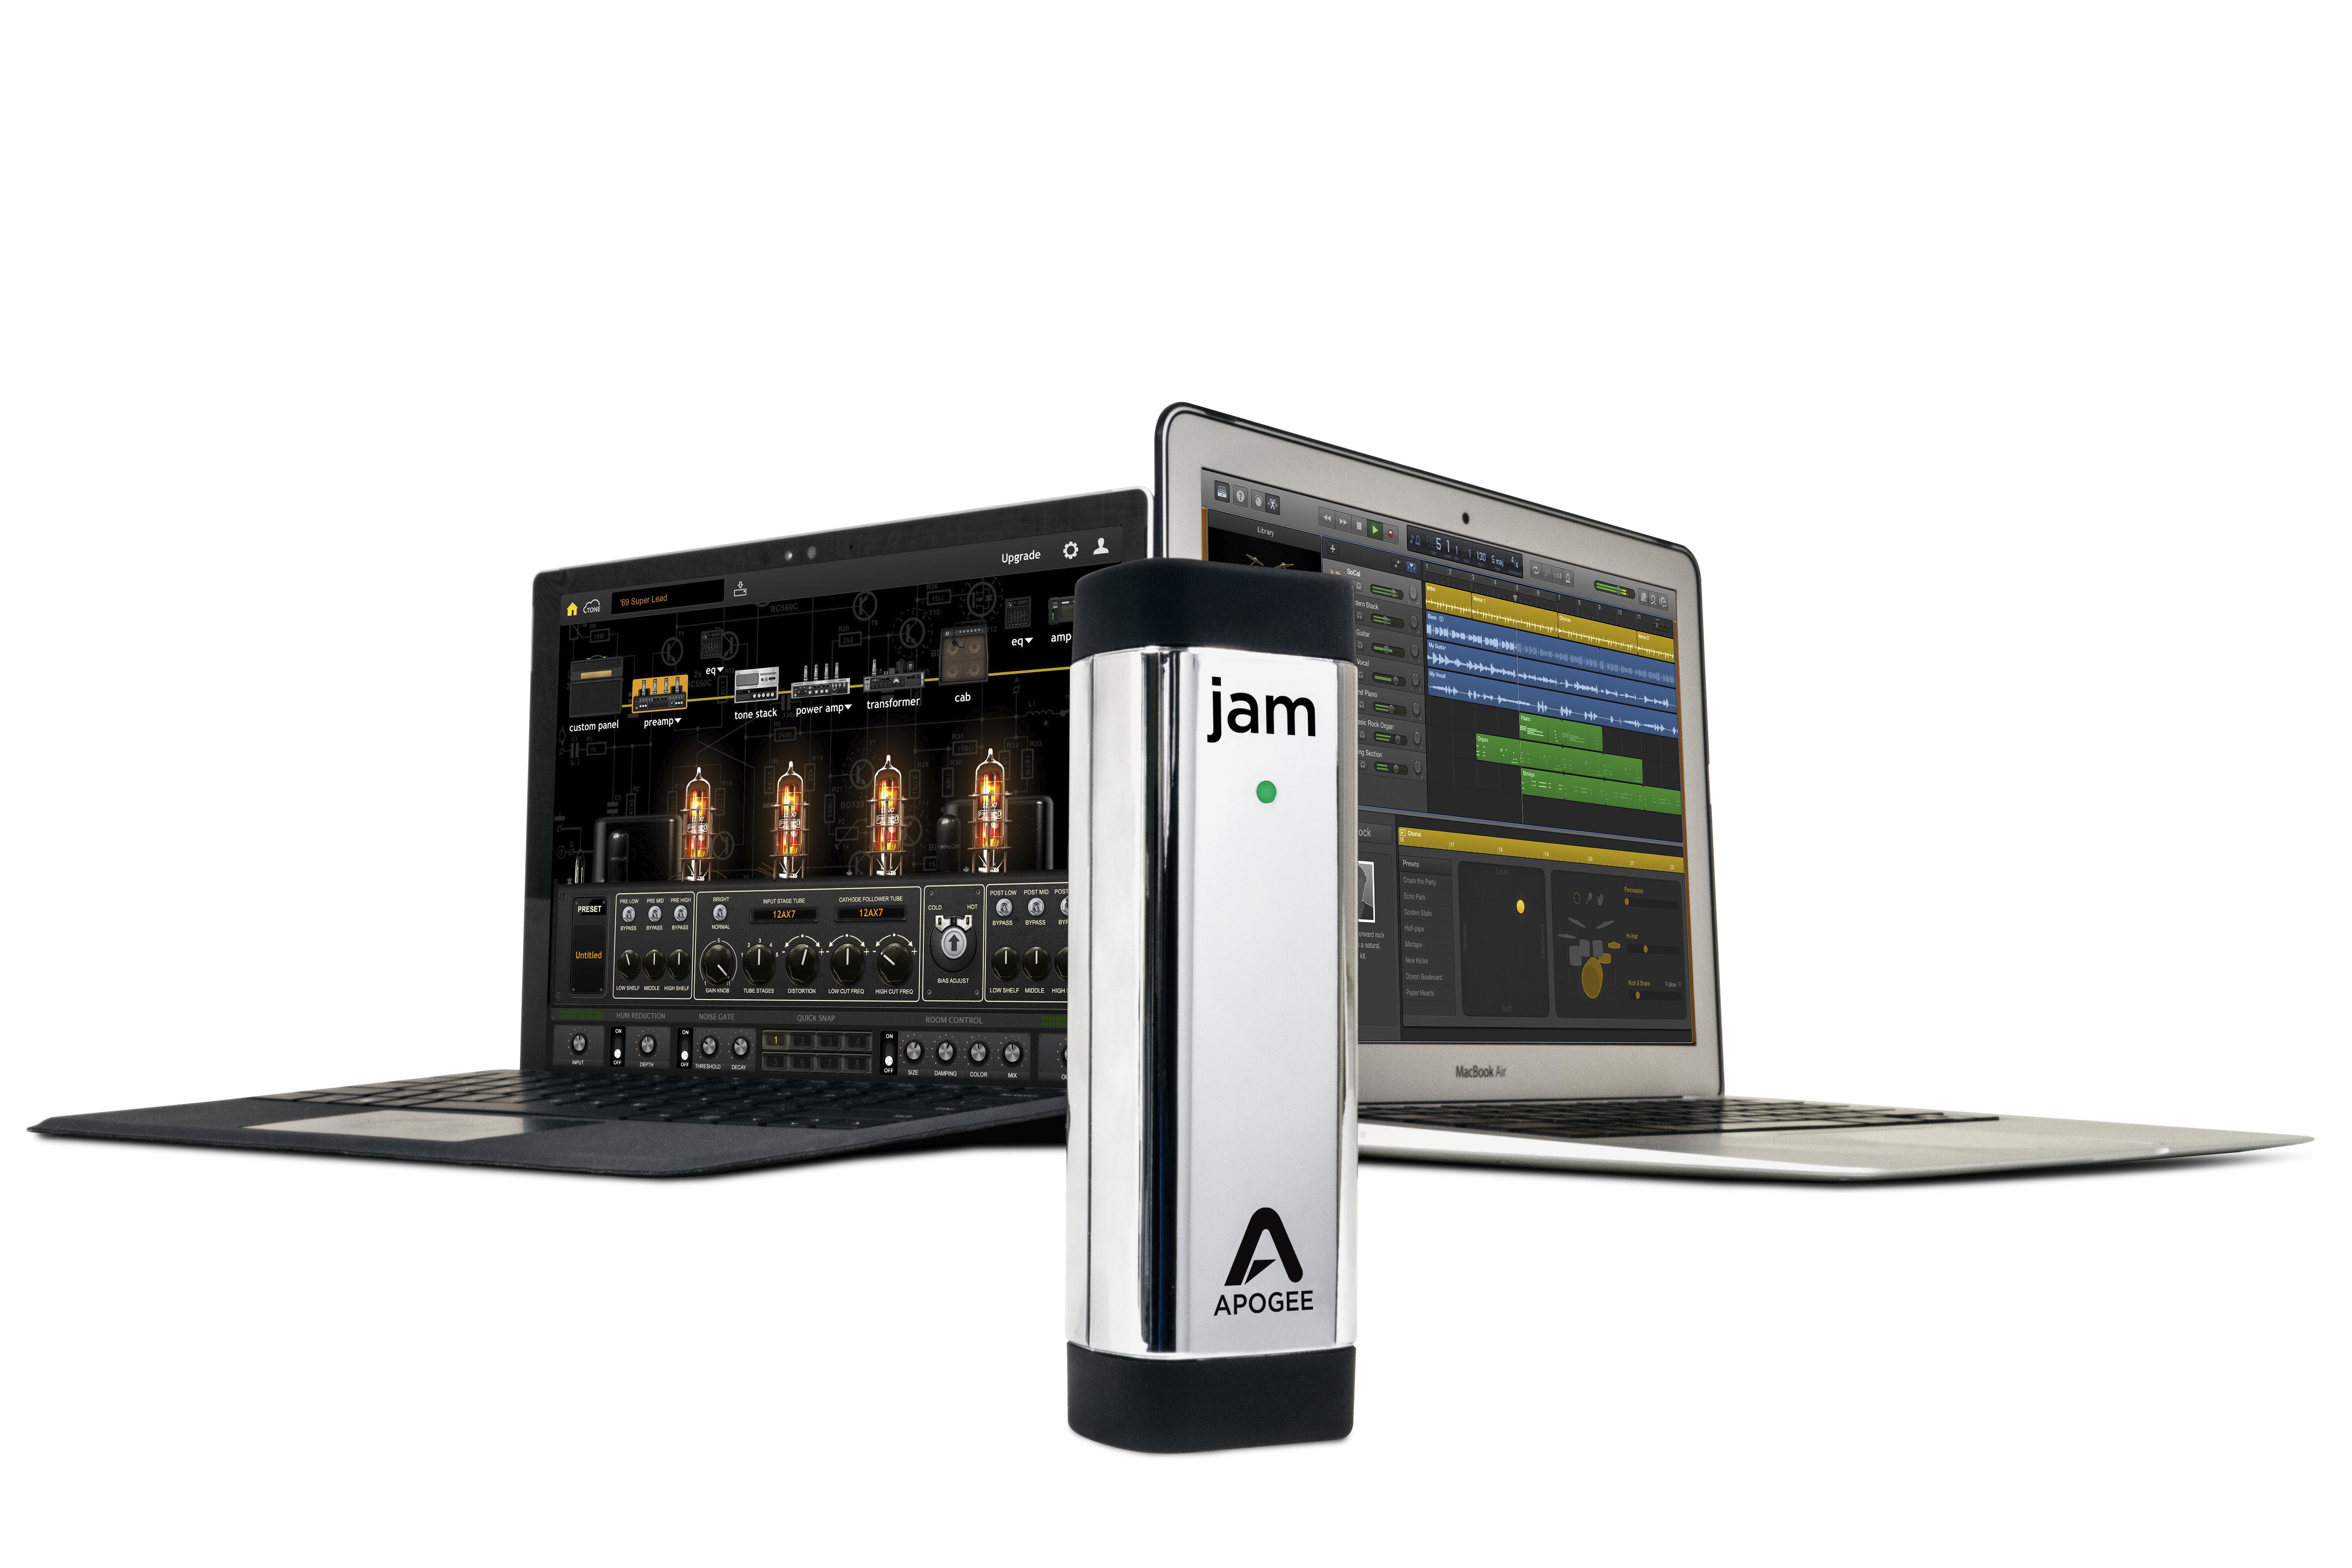 apogee announces jam 96k for windows and mac music instrument news. Black Bedroom Furniture Sets. Home Design Ideas